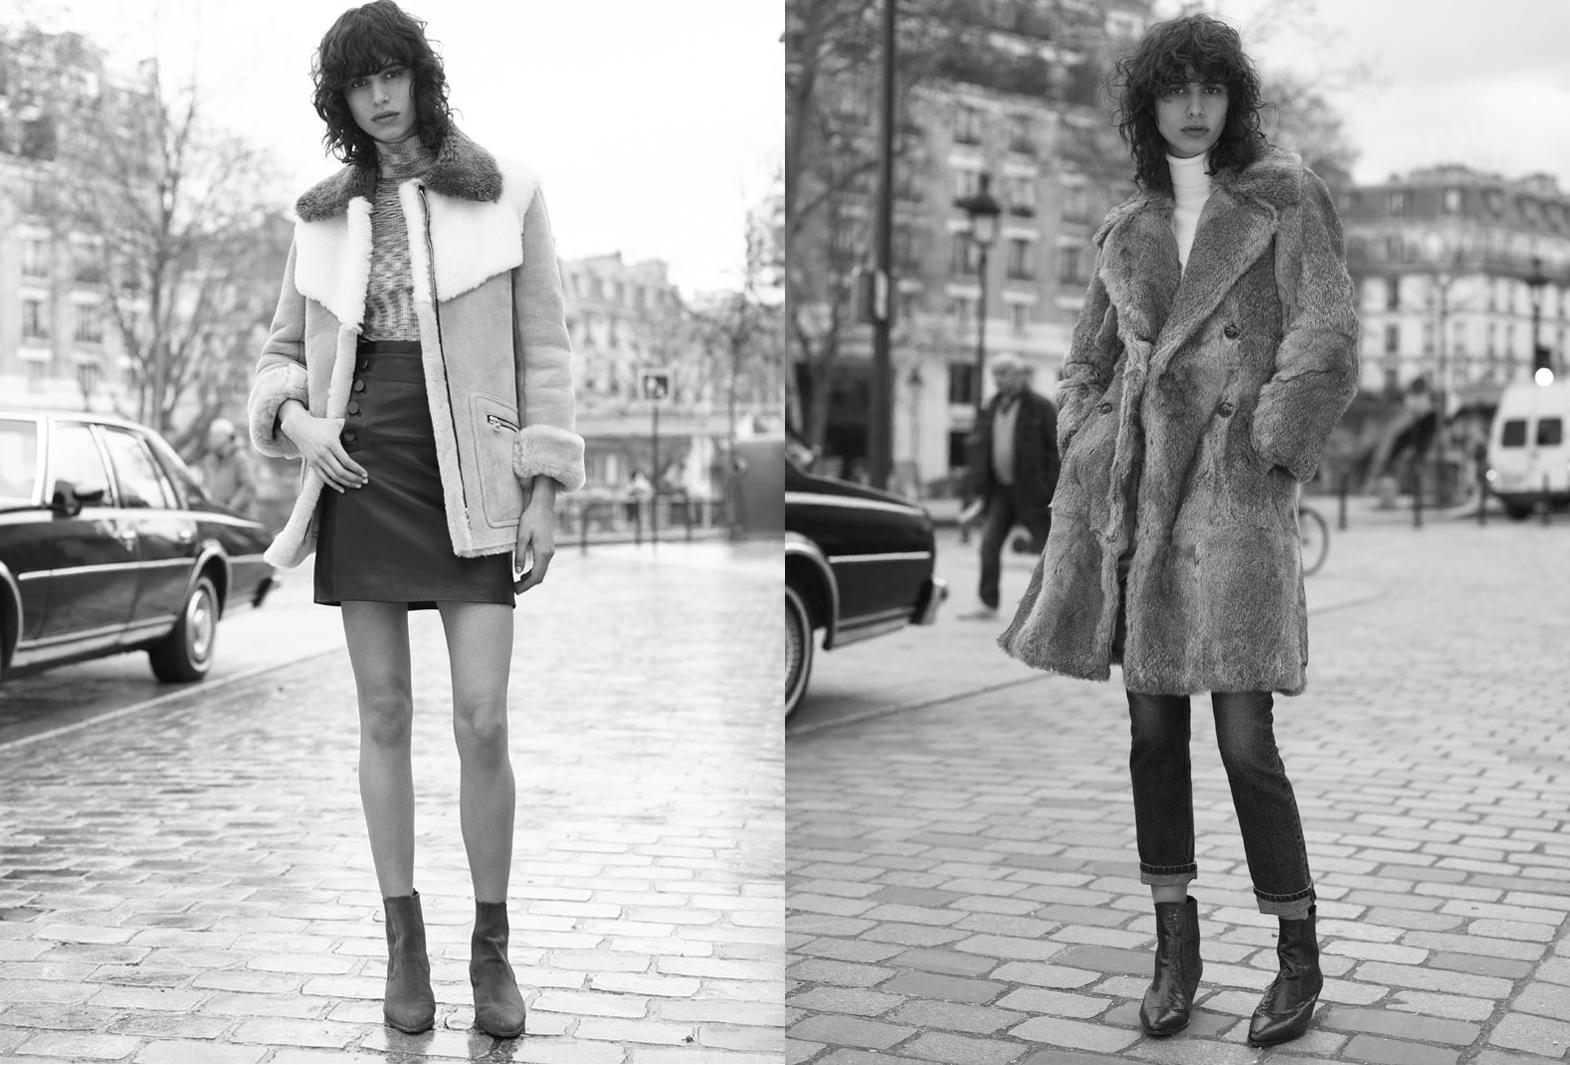 a70306e262 Sandro collection automne-hiver 2015-2016 – Taaora – Blog Mode ...